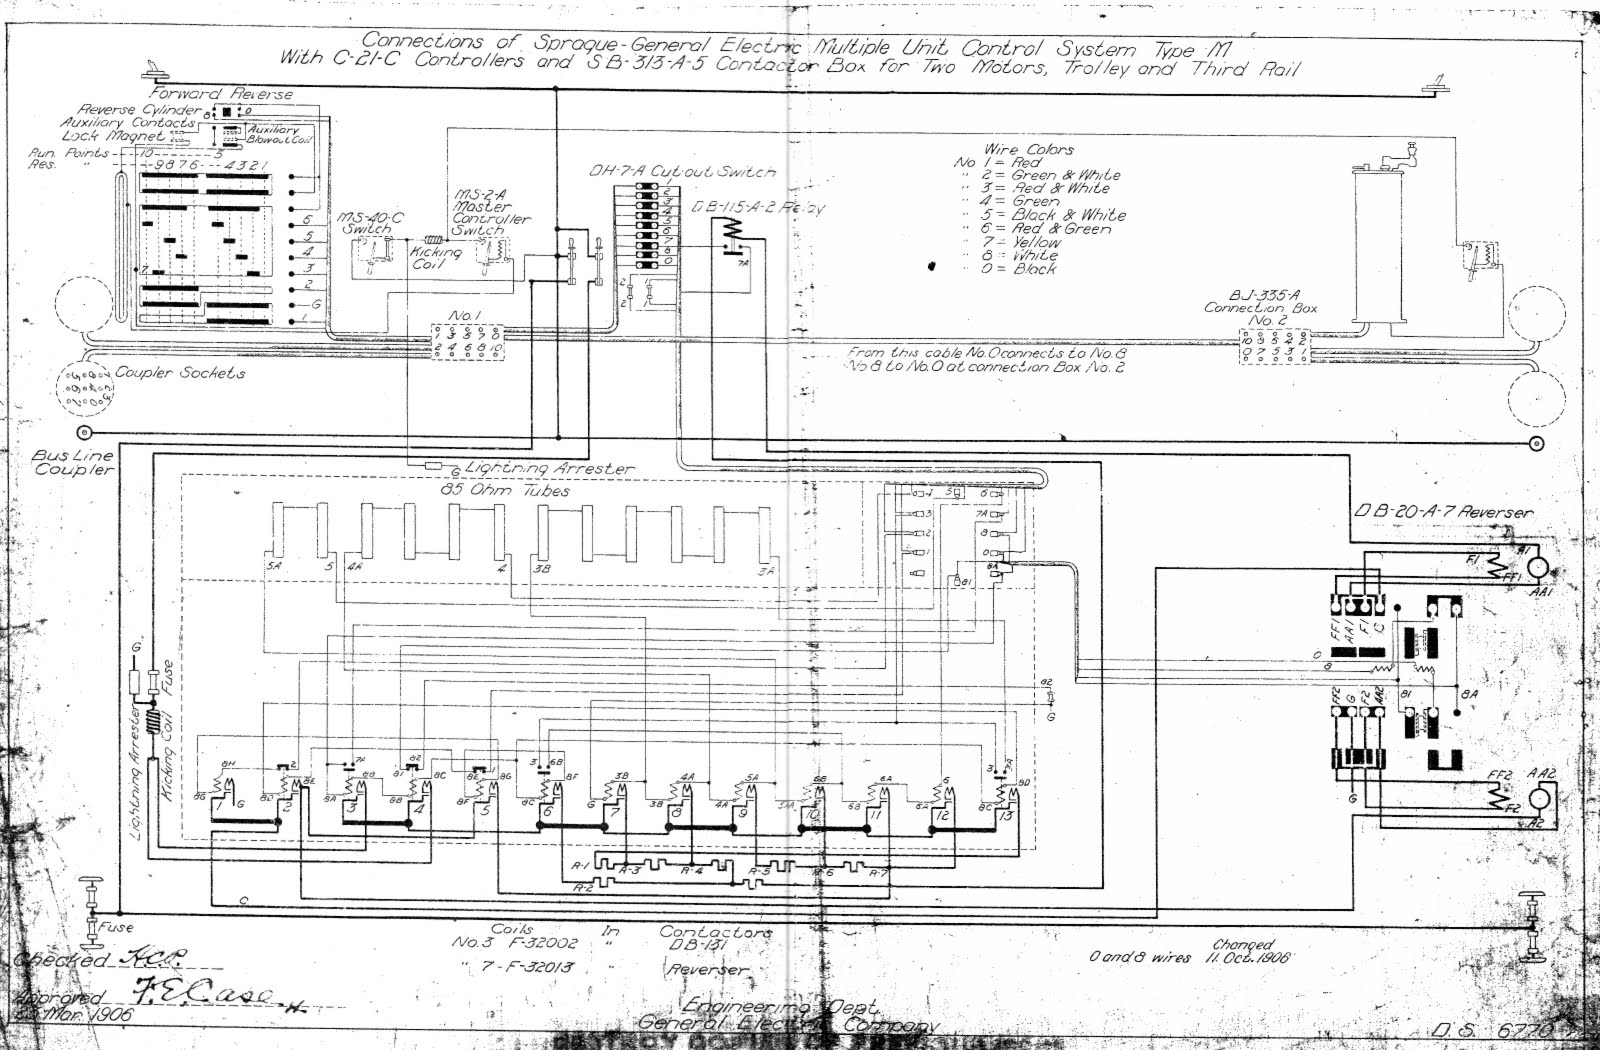 medium resolution of wiring diagram in addition 2006 isuzu npr glow plug wiring diagram 2000 isuzu npr abs relay 2006 isuzu npr glow plug wiring diagram